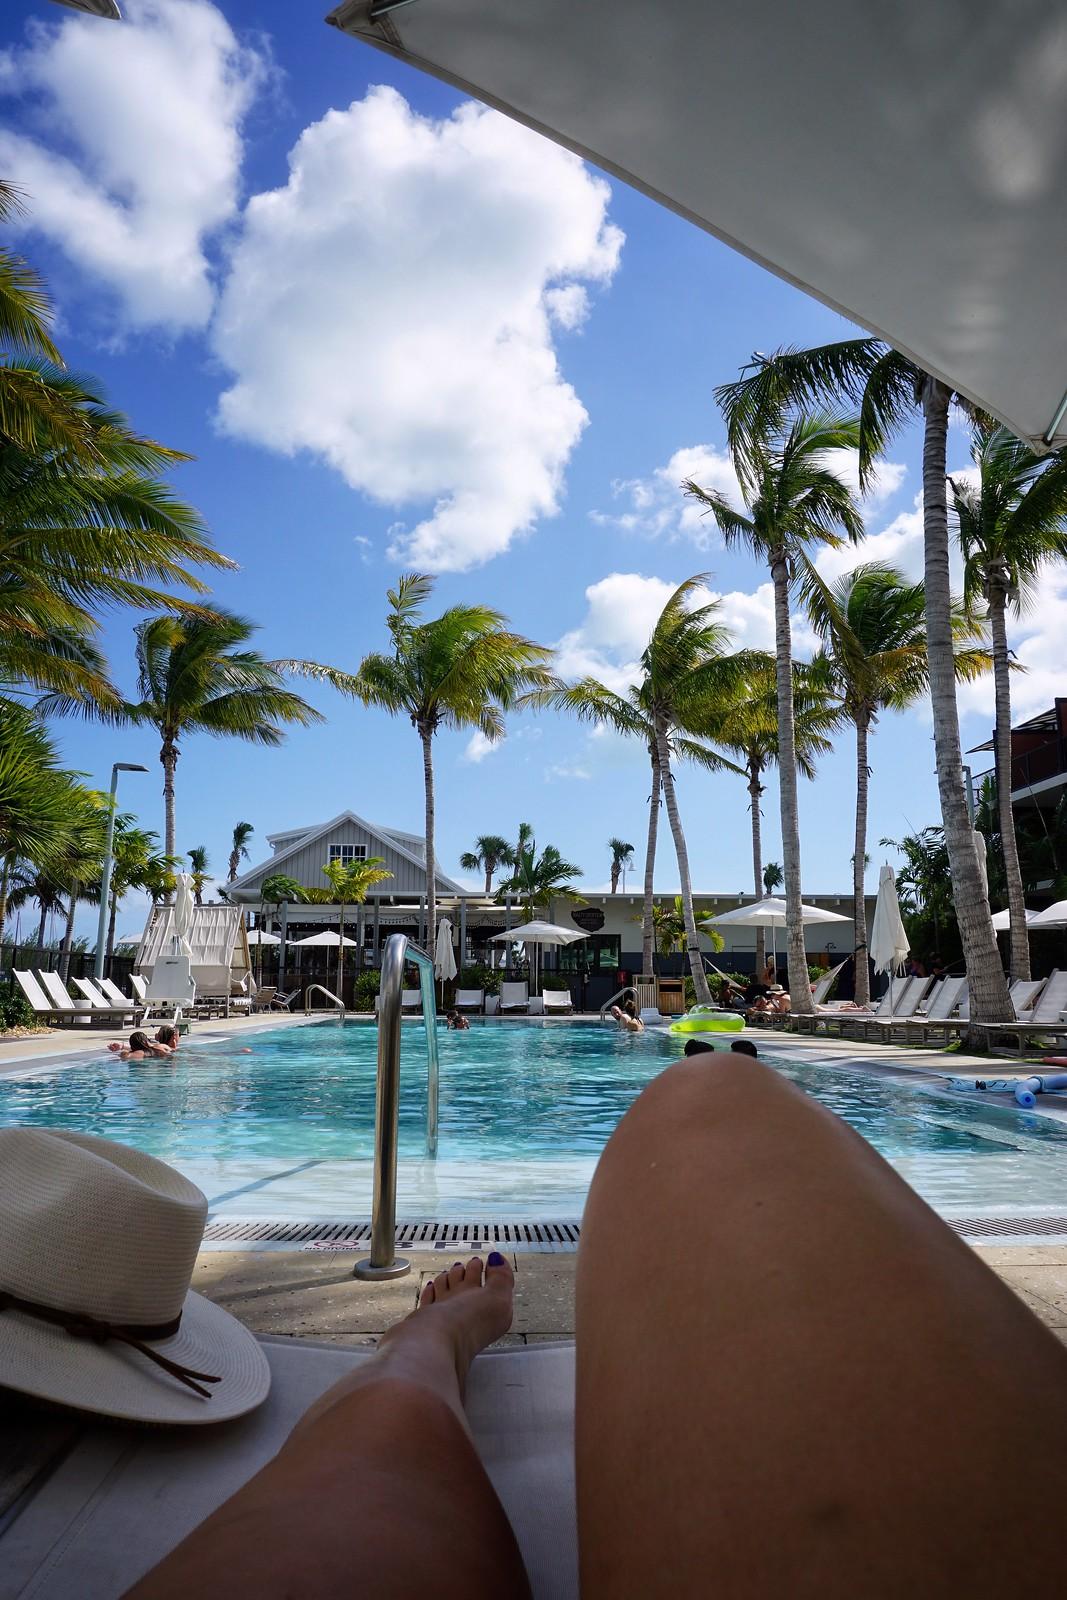 perry-hotel-pool-ultimate-road-trip-5-days-florida-keys-itinerary-what-to-do-key-west-key-largo-islamorada-marathon-miami-vacation-guide